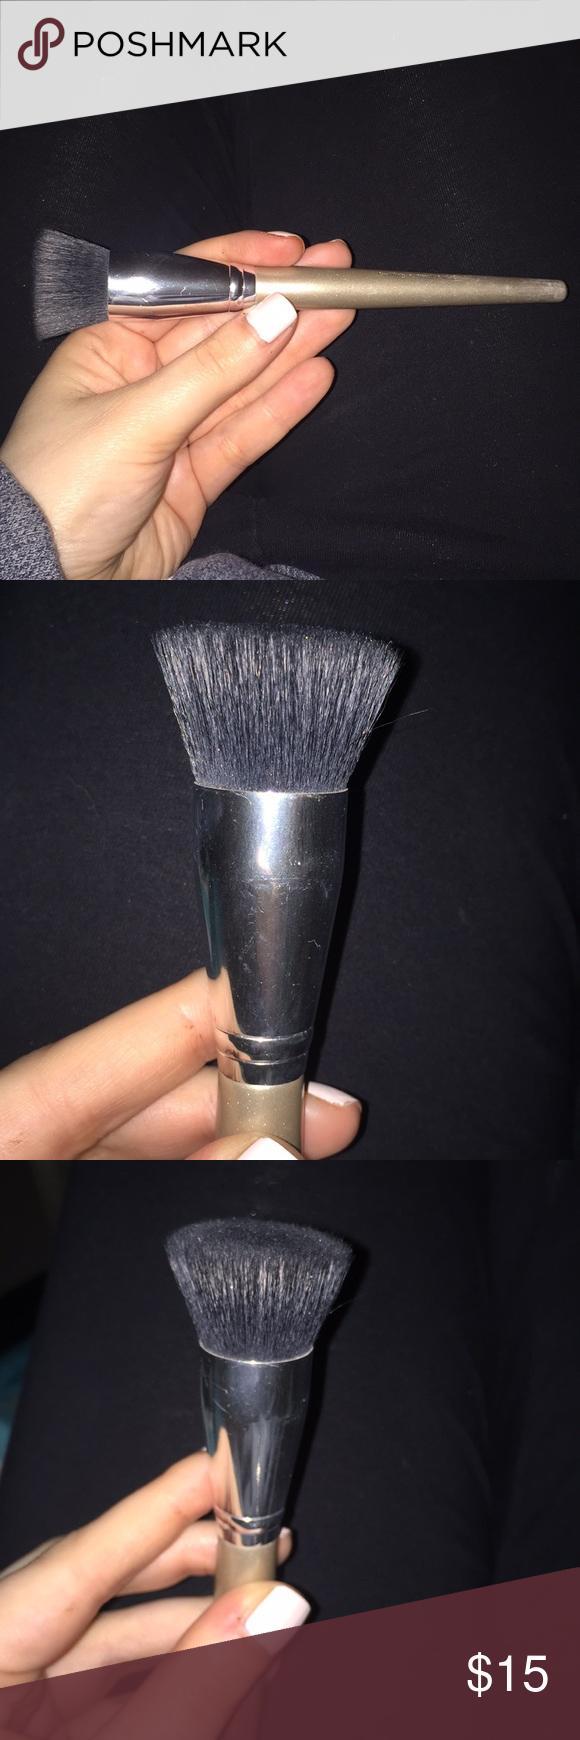 Make up Buffing brush from Sephora Full size buffing brush